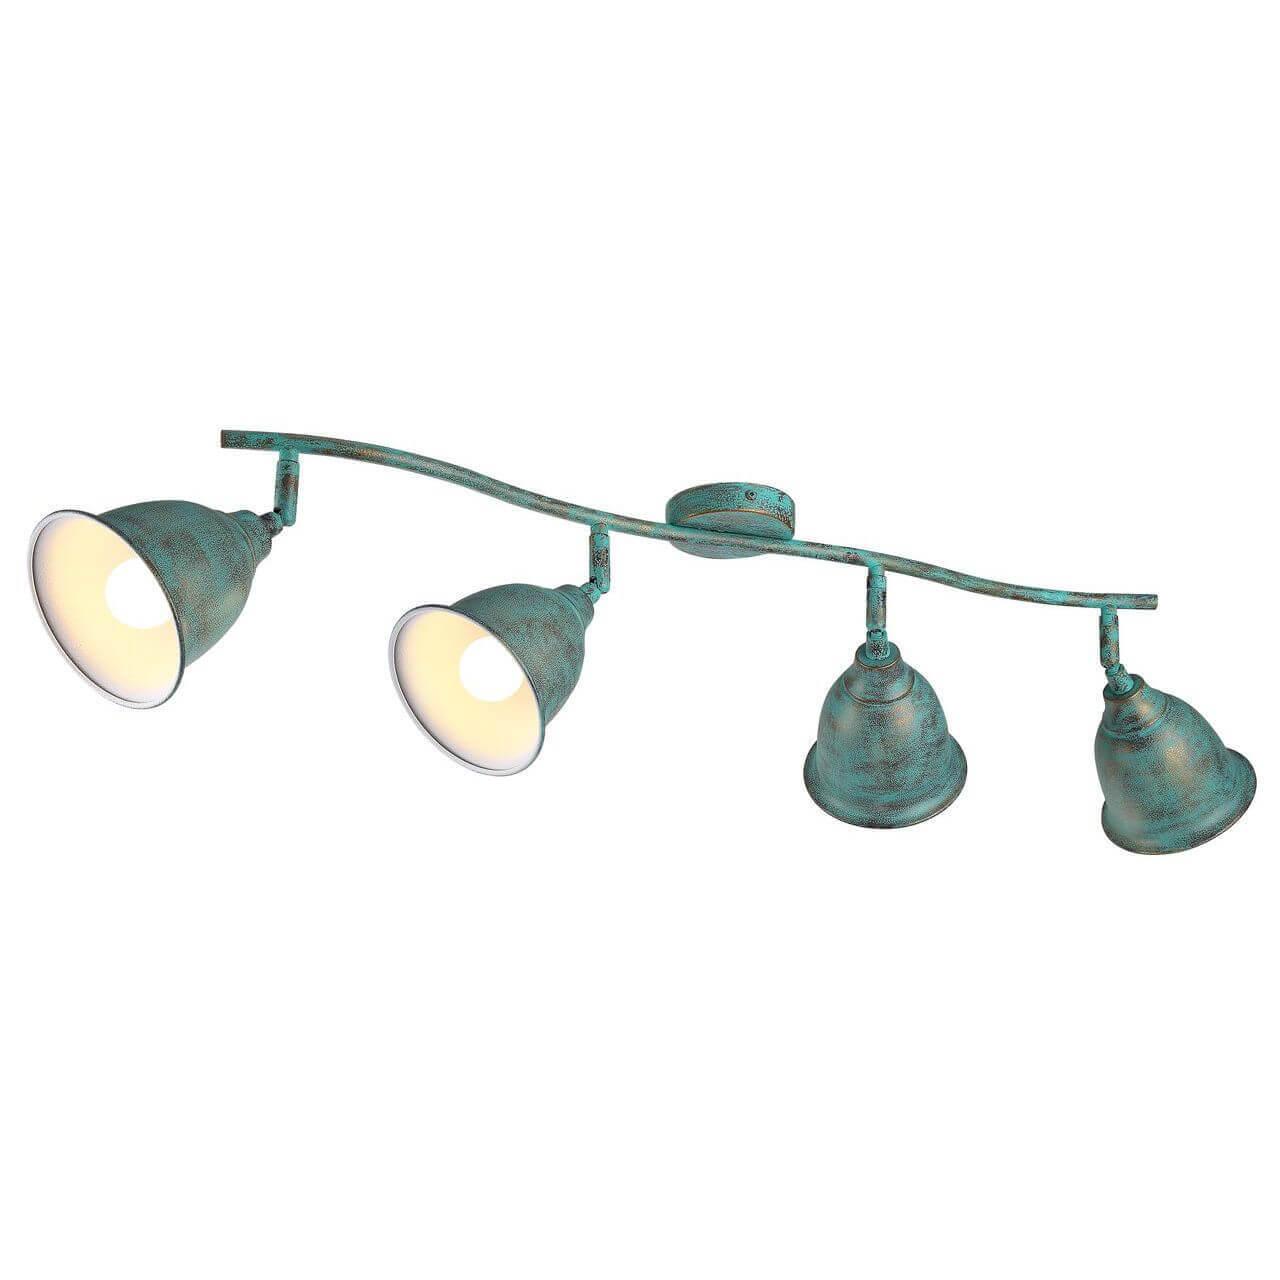 Спот Arte Lamp A9557PL-4BG Campana BG arte lamp потолочный спот arte lamp campana a9557pl 4cc